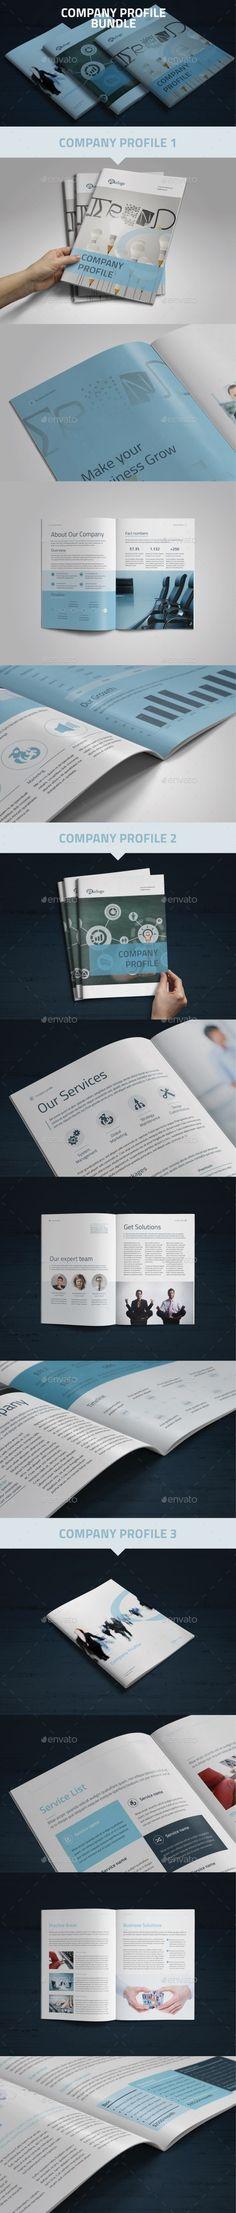 Company Profile Brochure Template Bundle #brochure download: http://graphicriver.net/item/company-profile-bundle/10865903?ref=ksioks